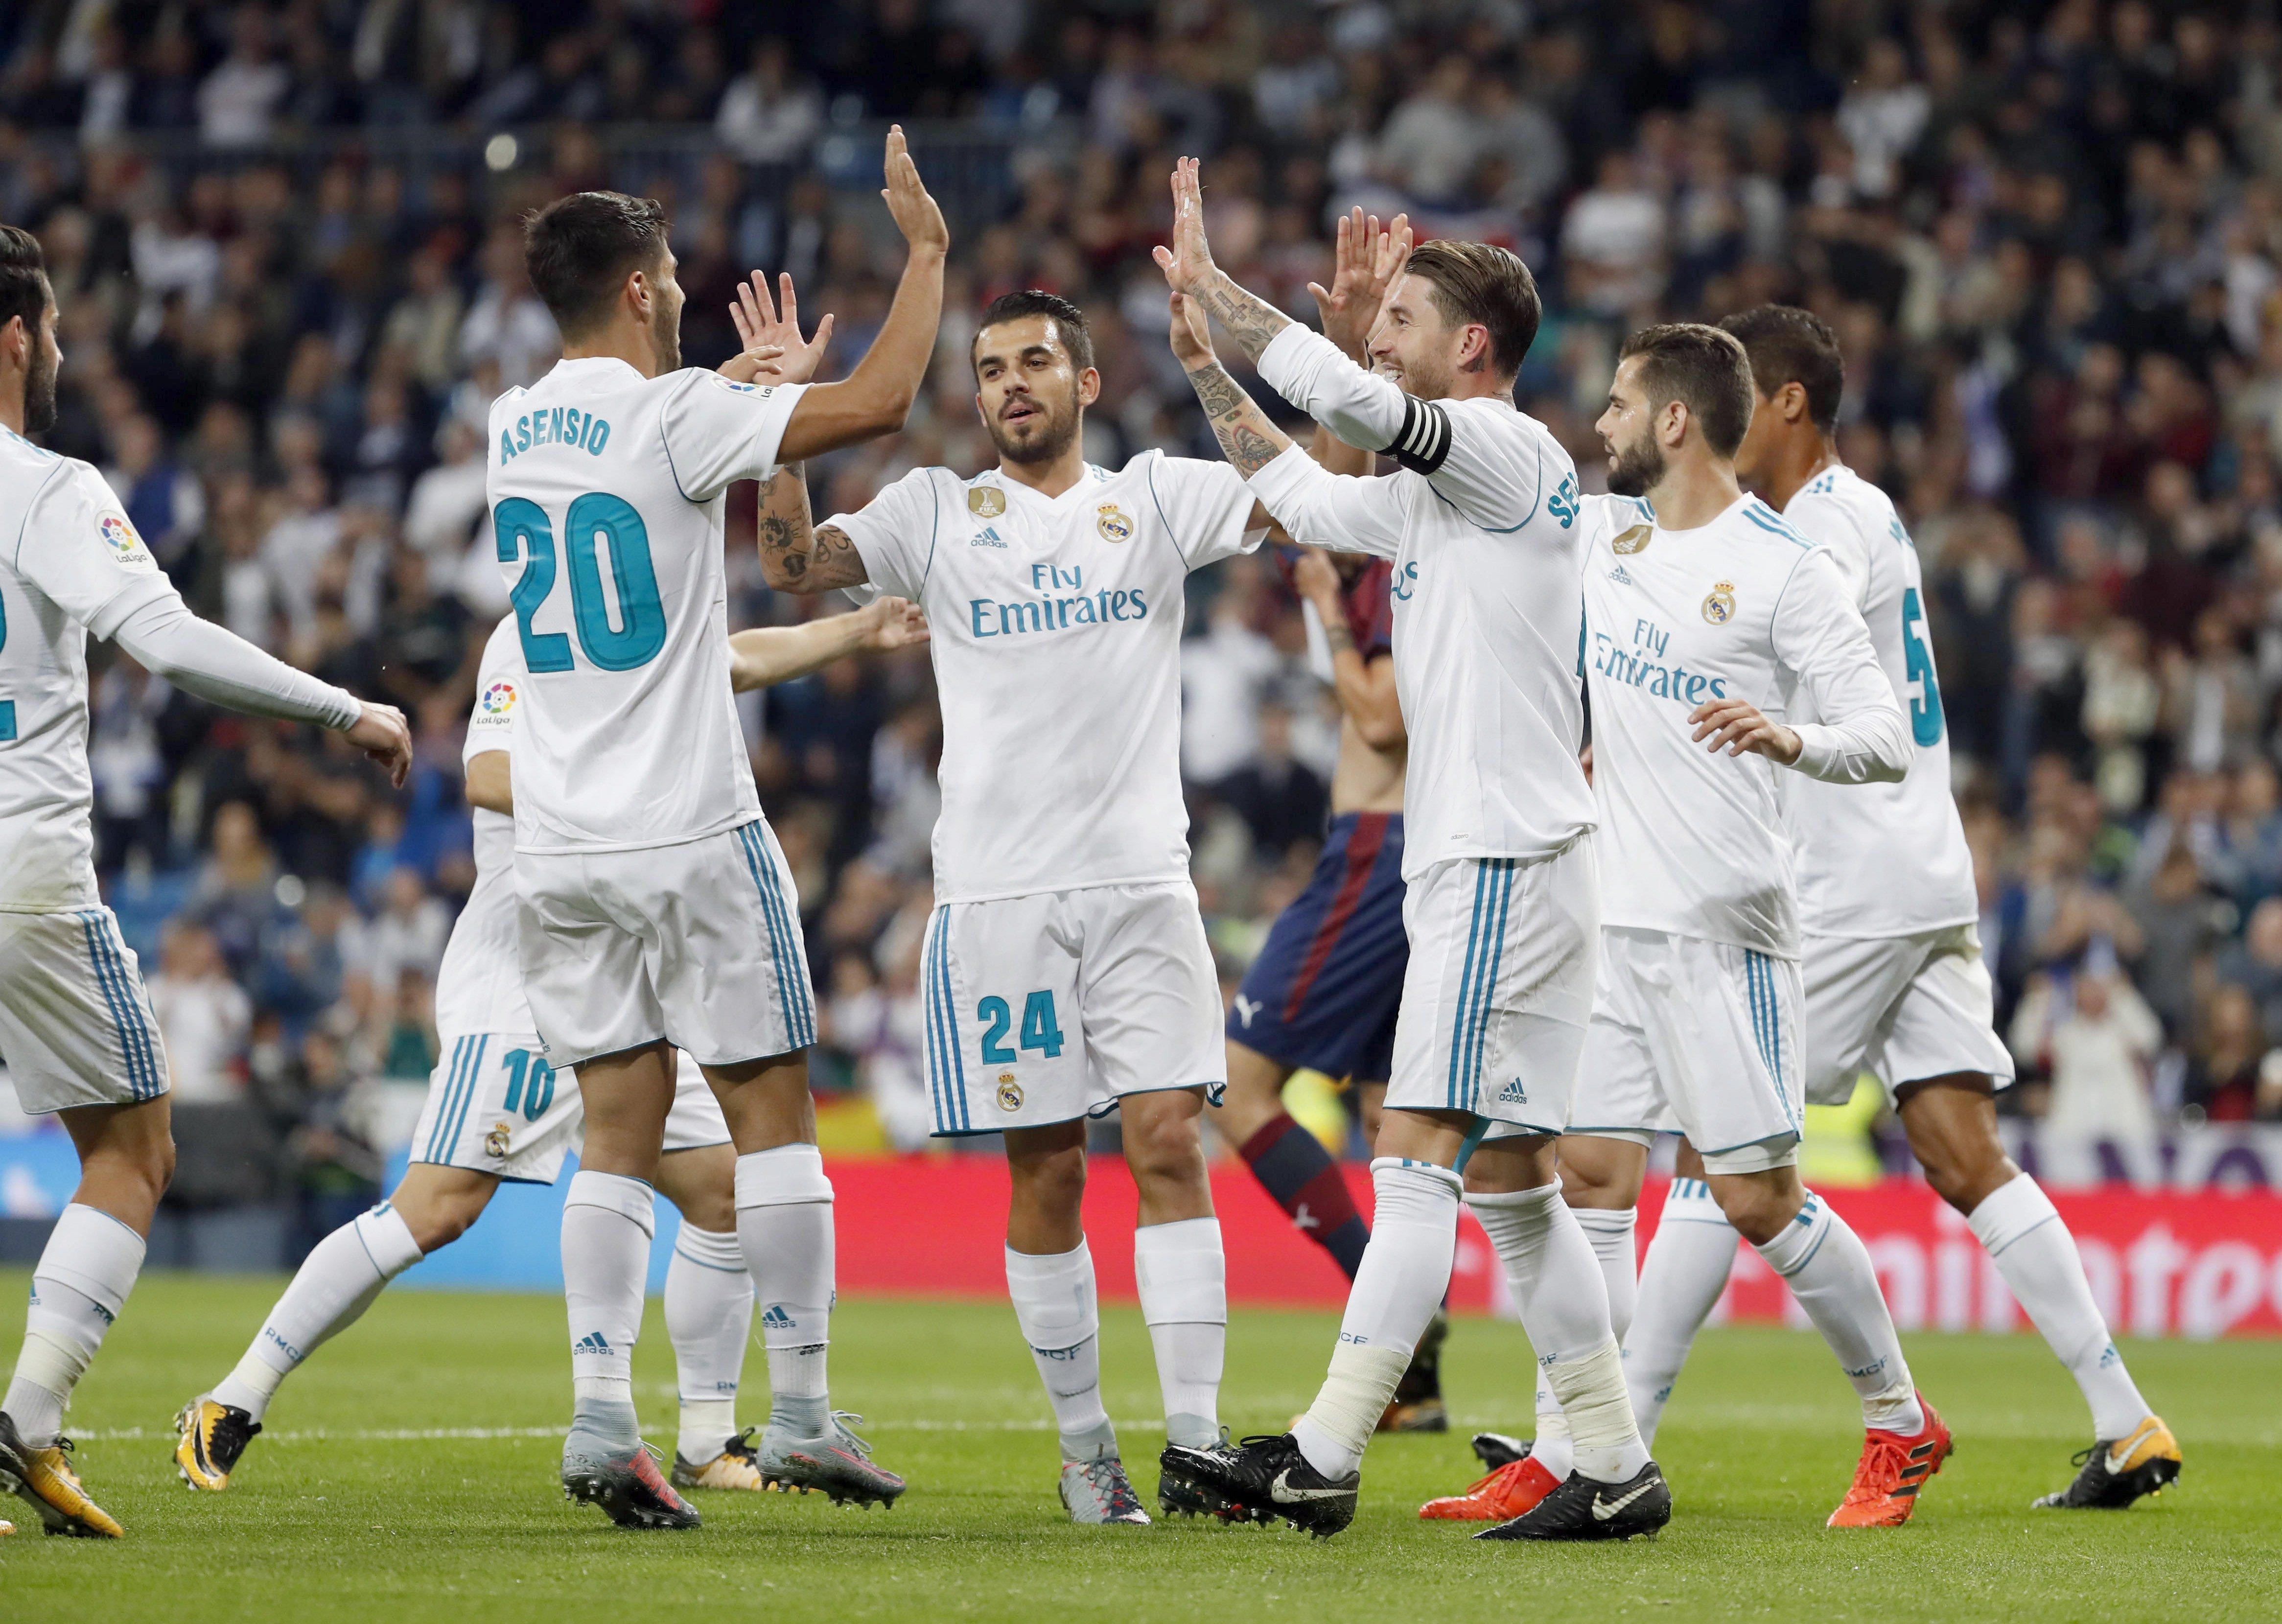 Reial Madrid gol Eibar Santiago Bernabeu   EFE